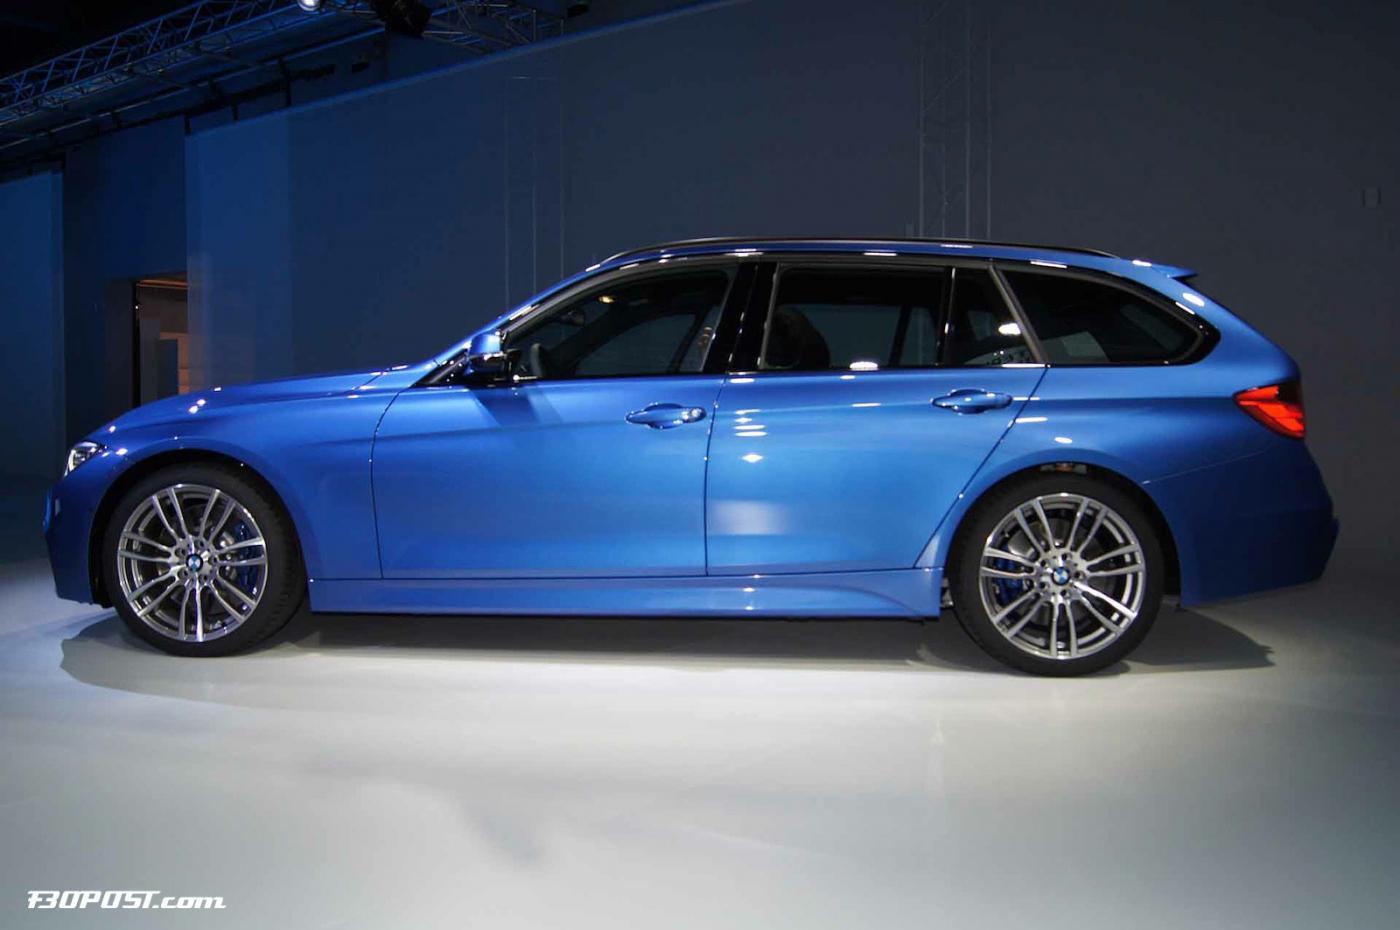 2013 Bmw F31 Touring Vs Audi A4 Avant Photo Comparo